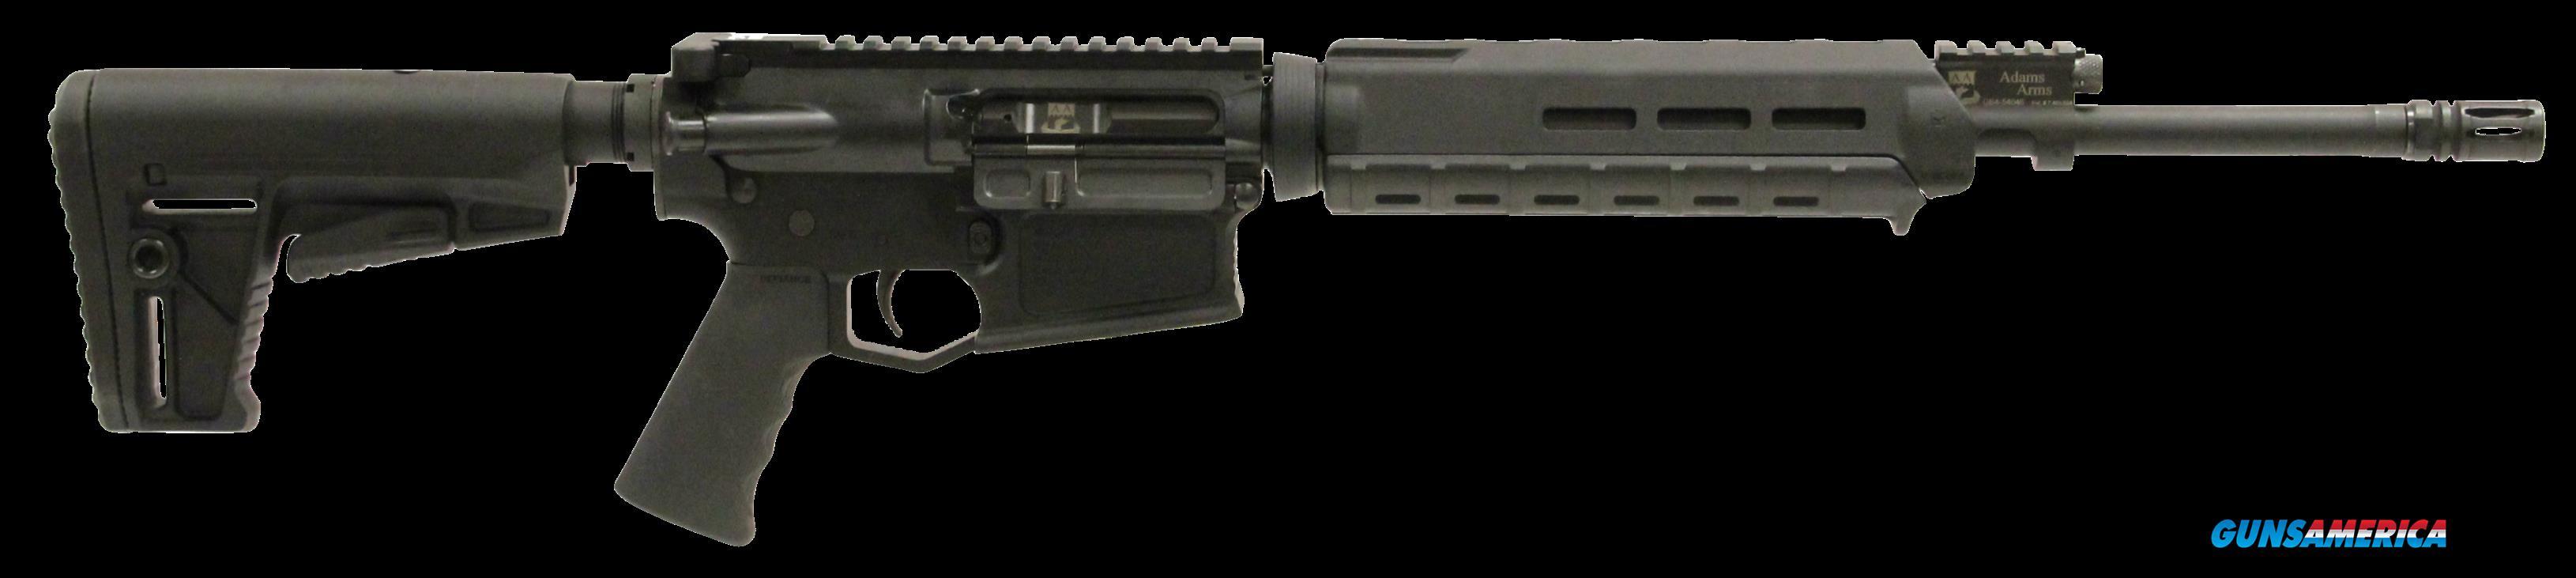 Adams Arms P1, Adams Fgaa00242 P1 Rifle  308     16in  Guns > Pistols > 1911 Pistol Copies (non-Colt)